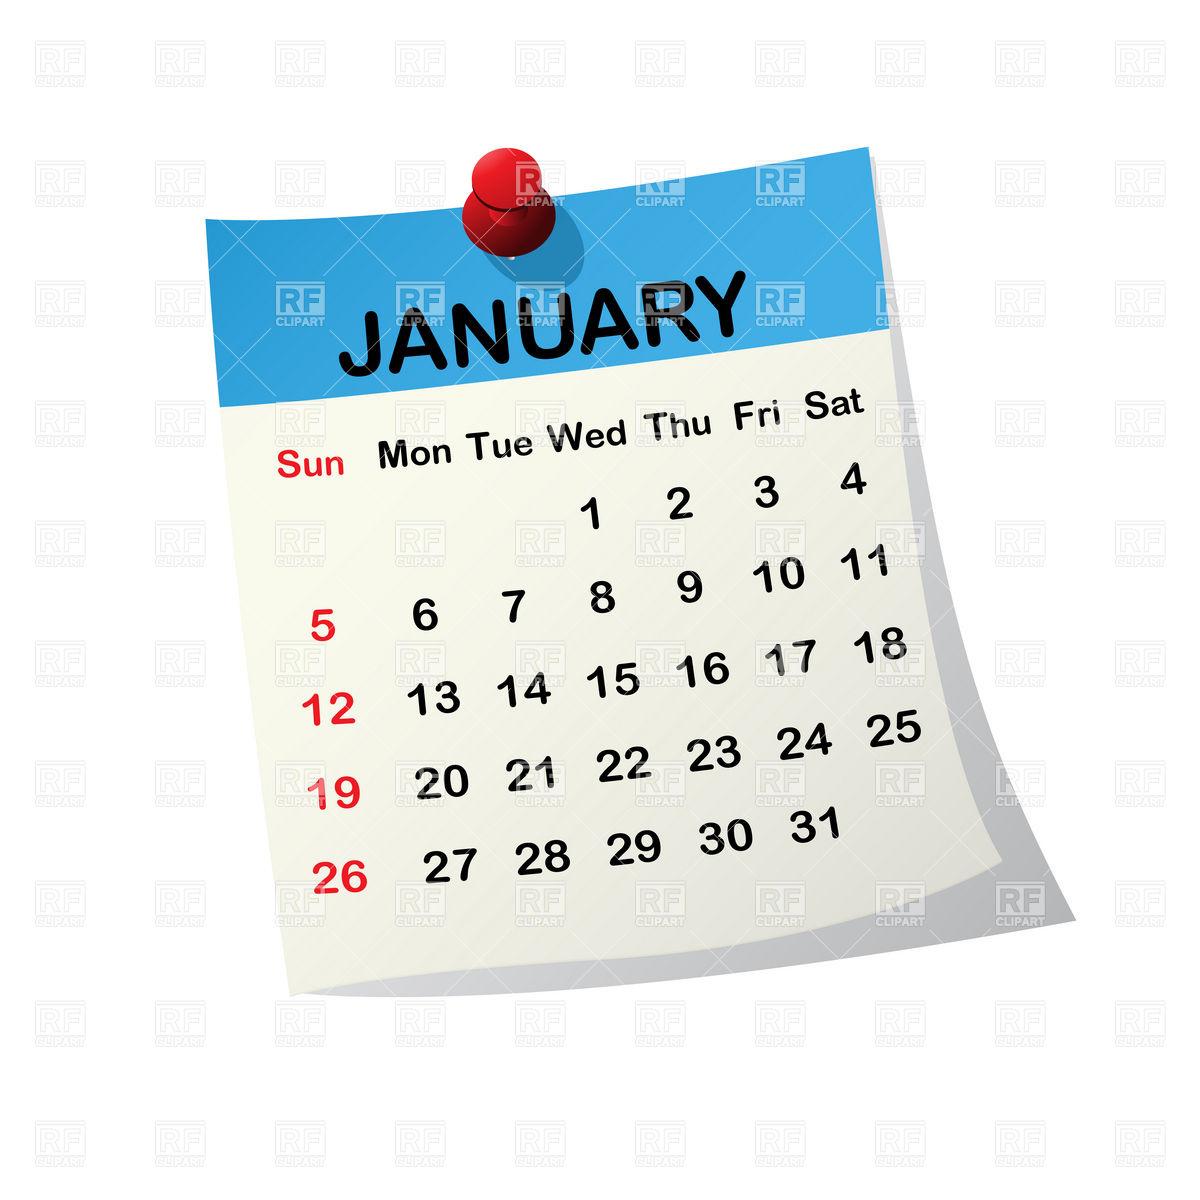 2016 January Calendar Clipart - Clipart Kid freeuse library